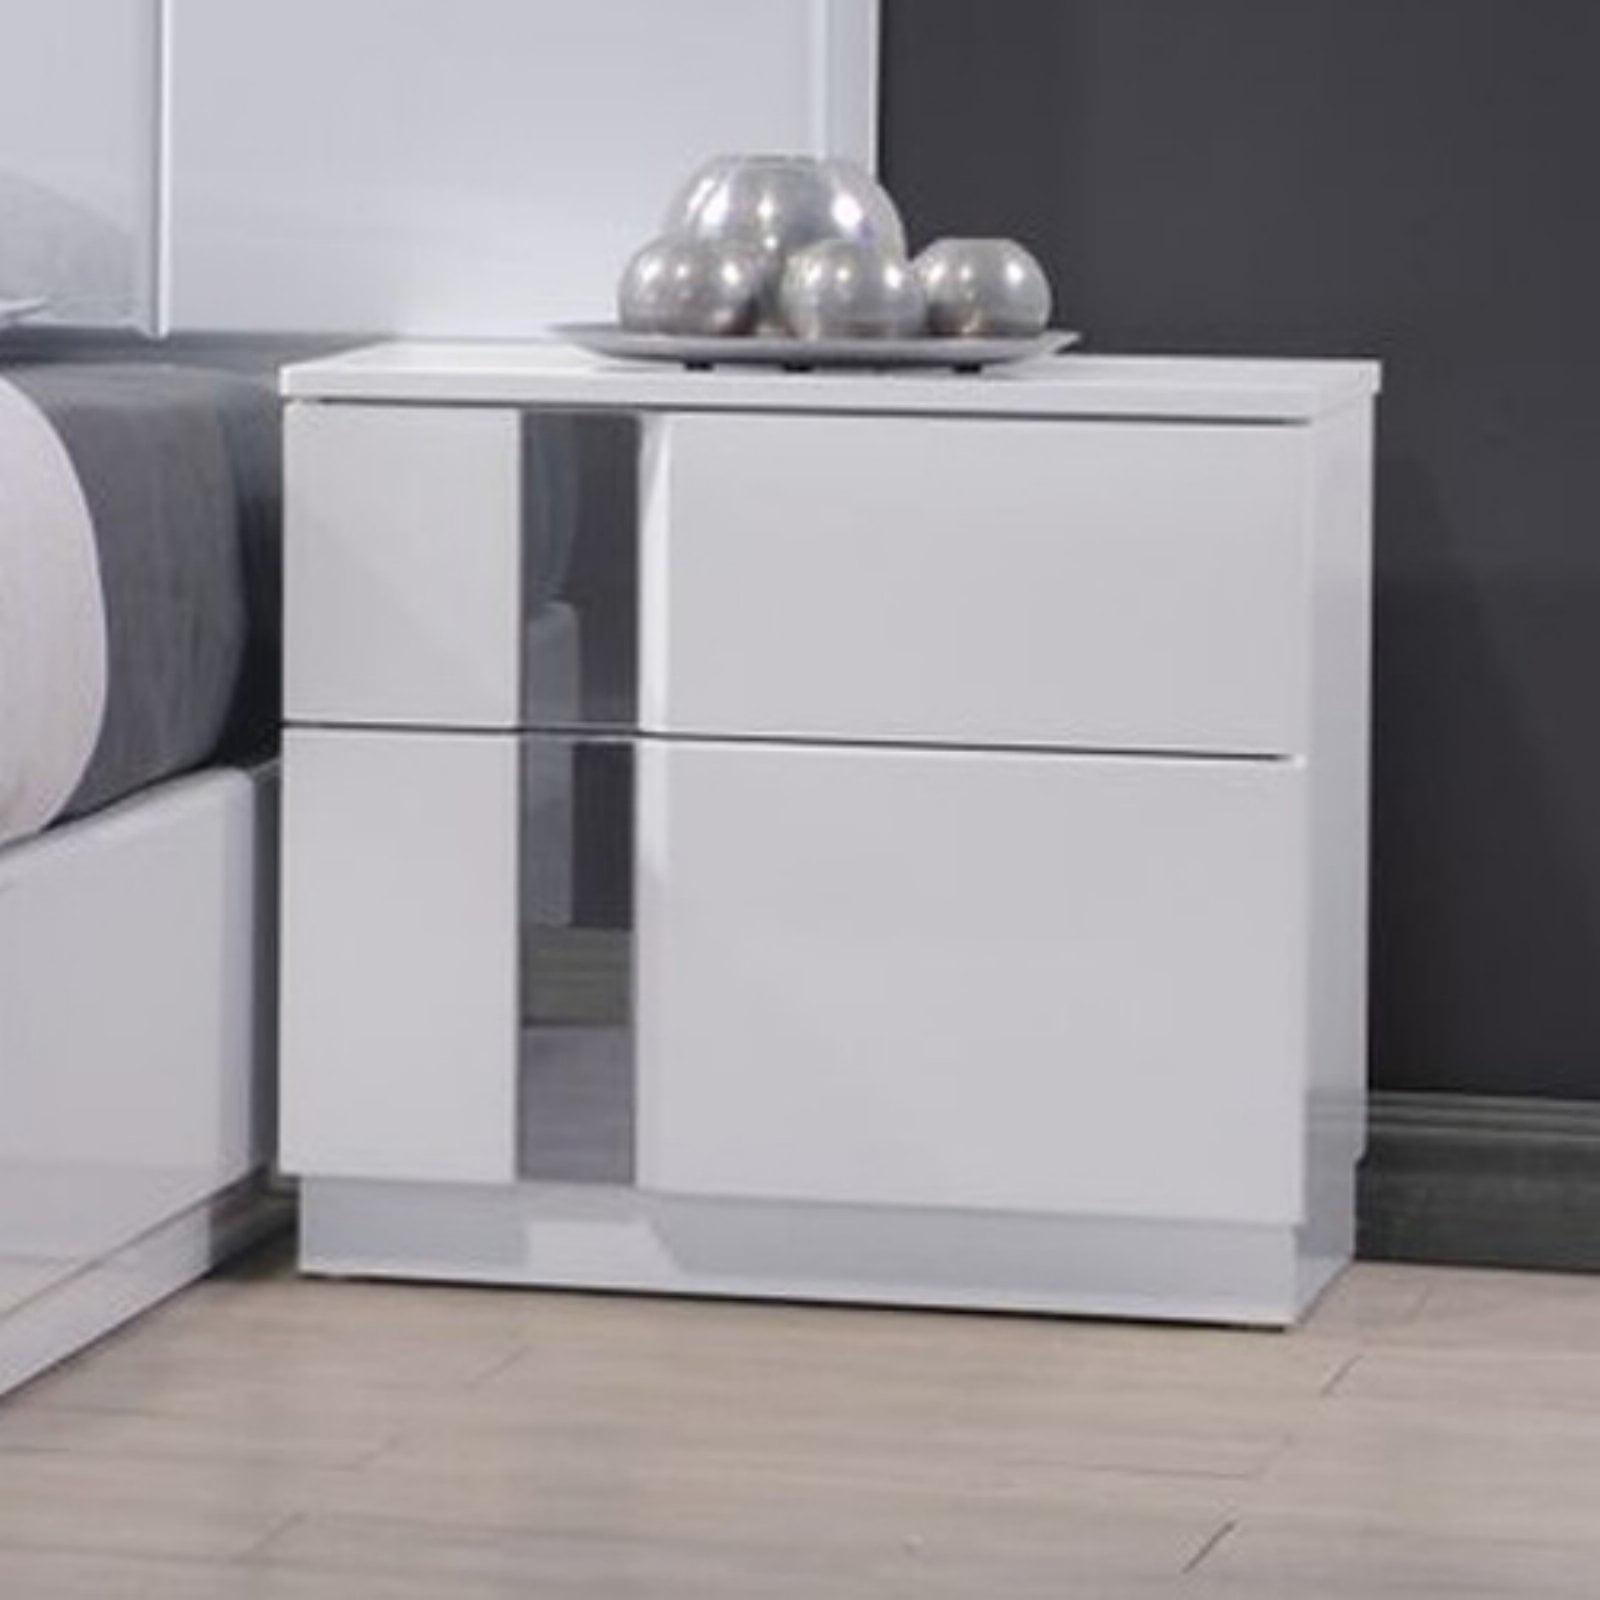 J&M Furniture Palermo 2 Drawer Nightstand